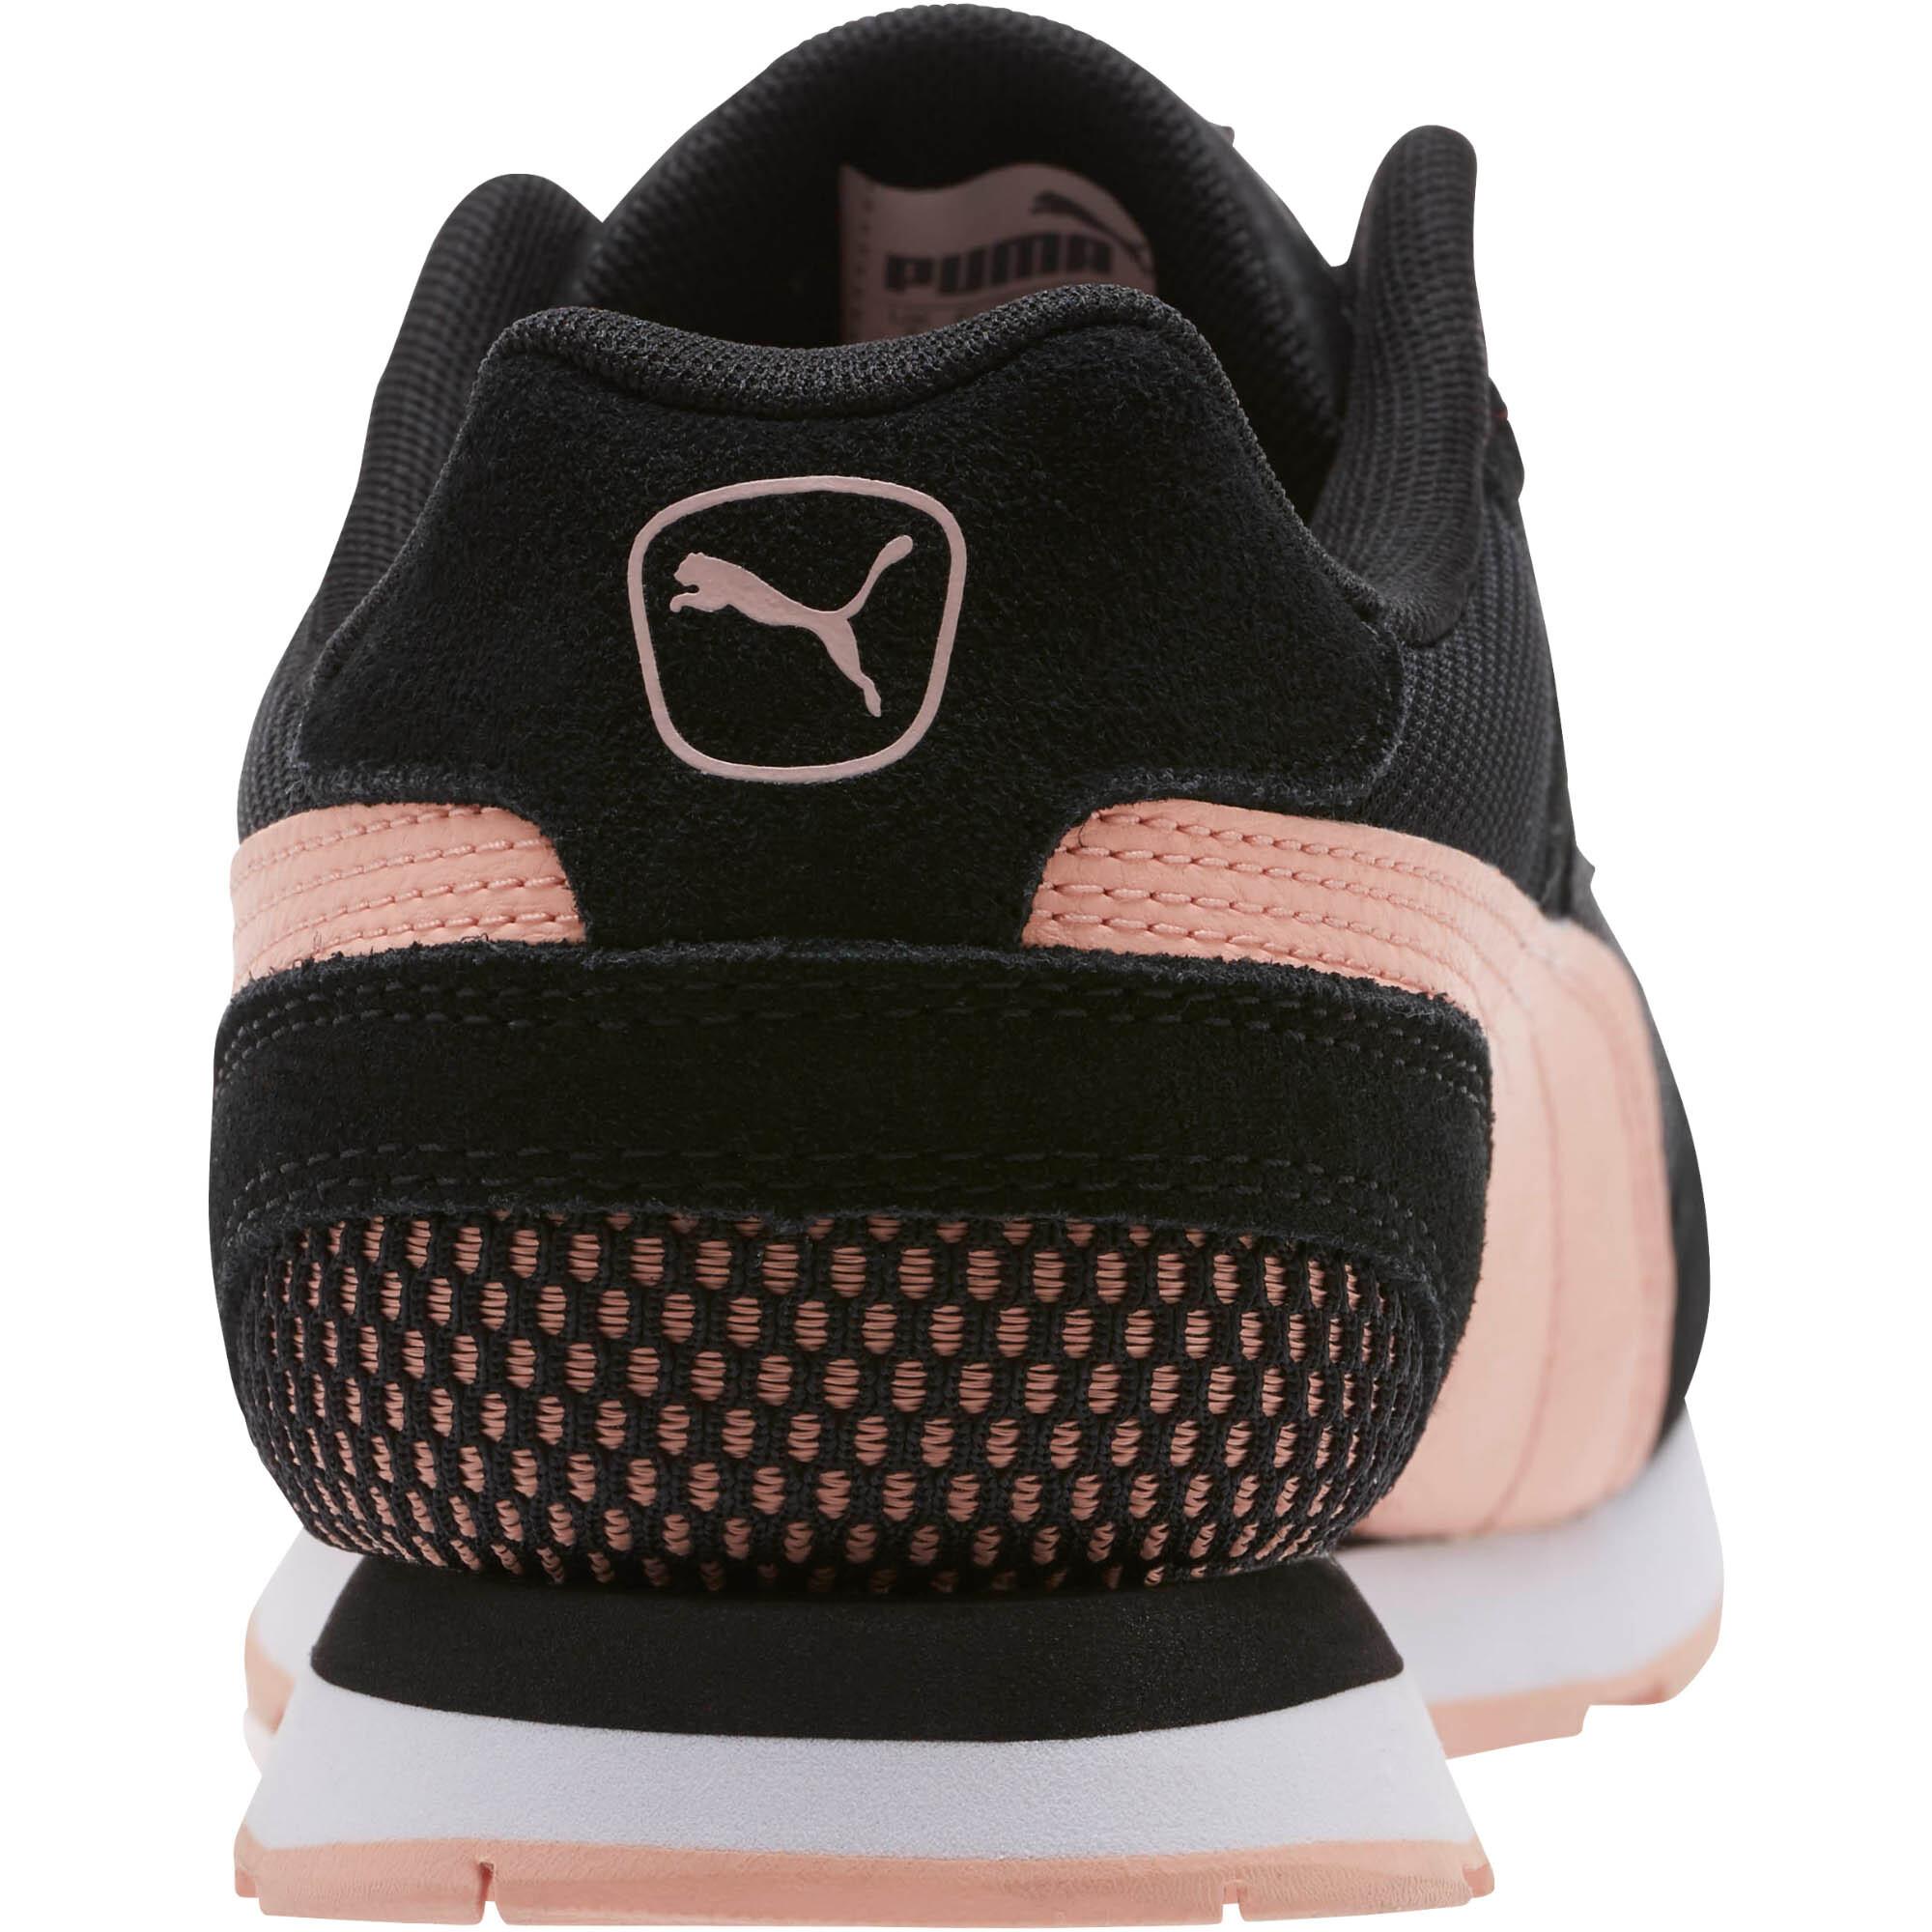 PUMA-Vista-Women-s-Sneakers-Women-Shoe-Basics thumbnail 8